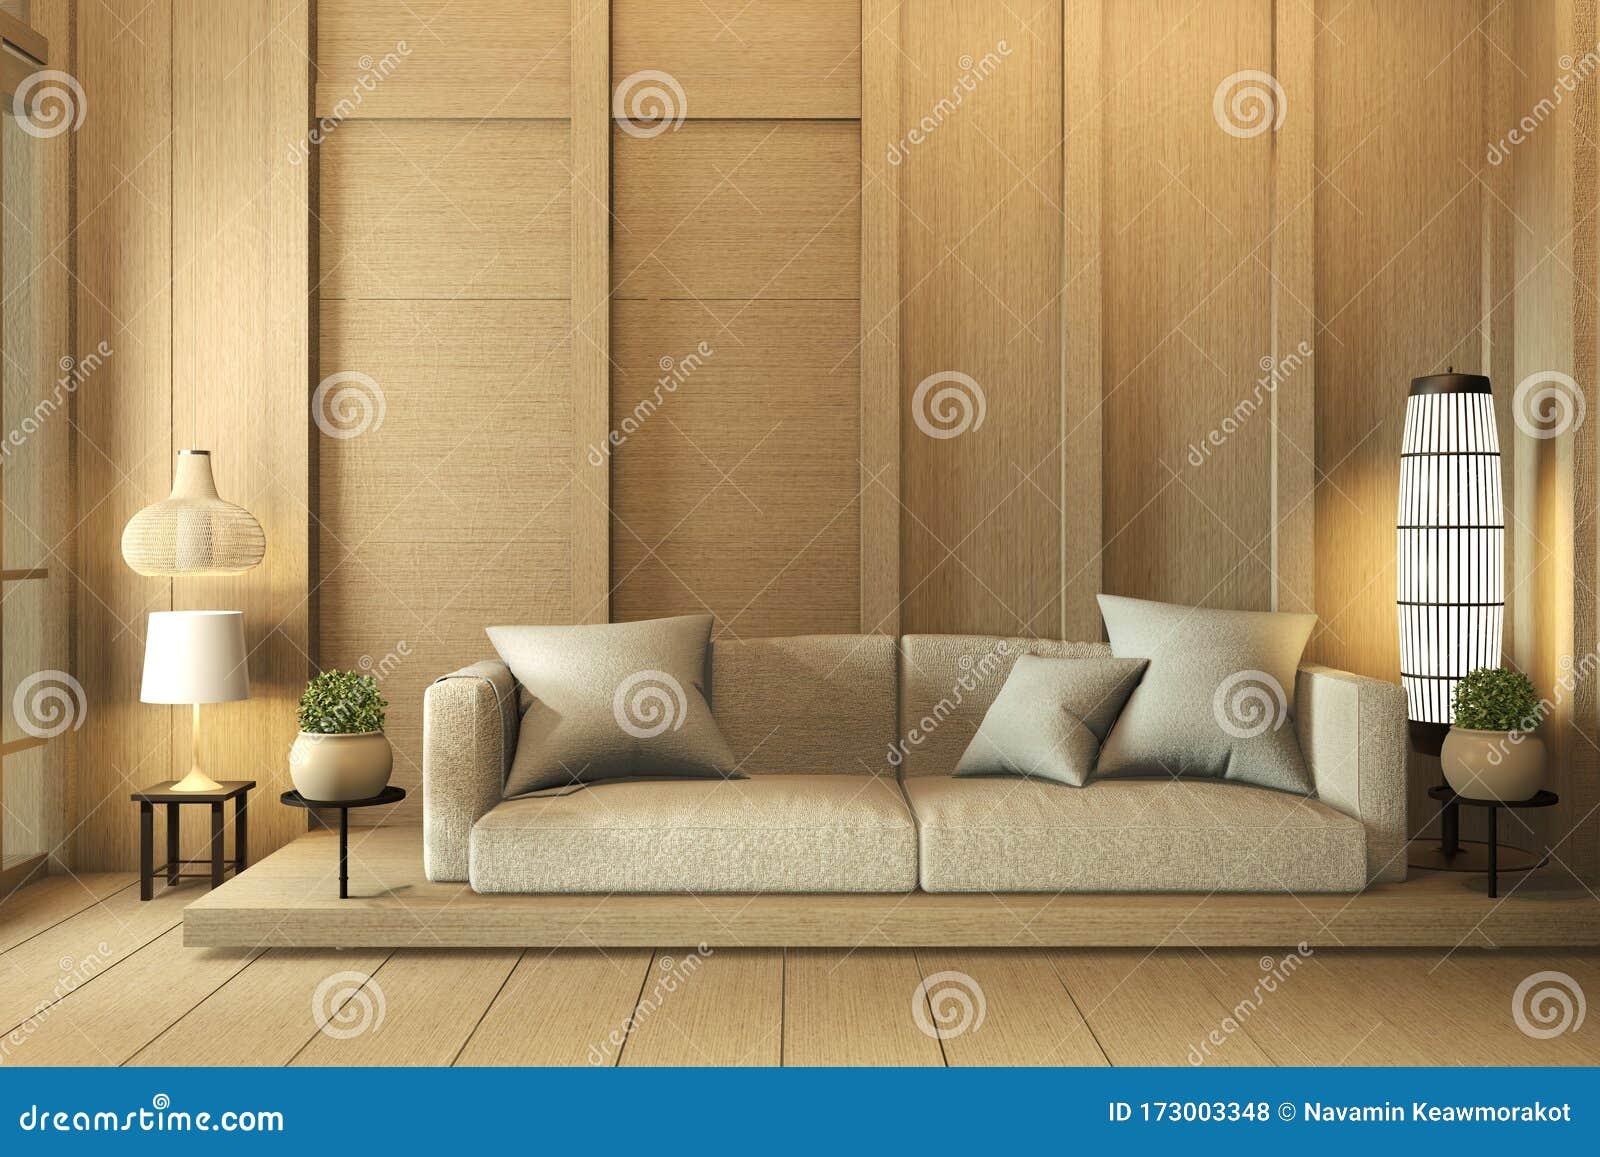 Mock Up Wall Wooden Interior Design Zen Modern Living Room Japanese Style 3d Rendering Stock Illustration Illustration Of Decoration Asian 173003348